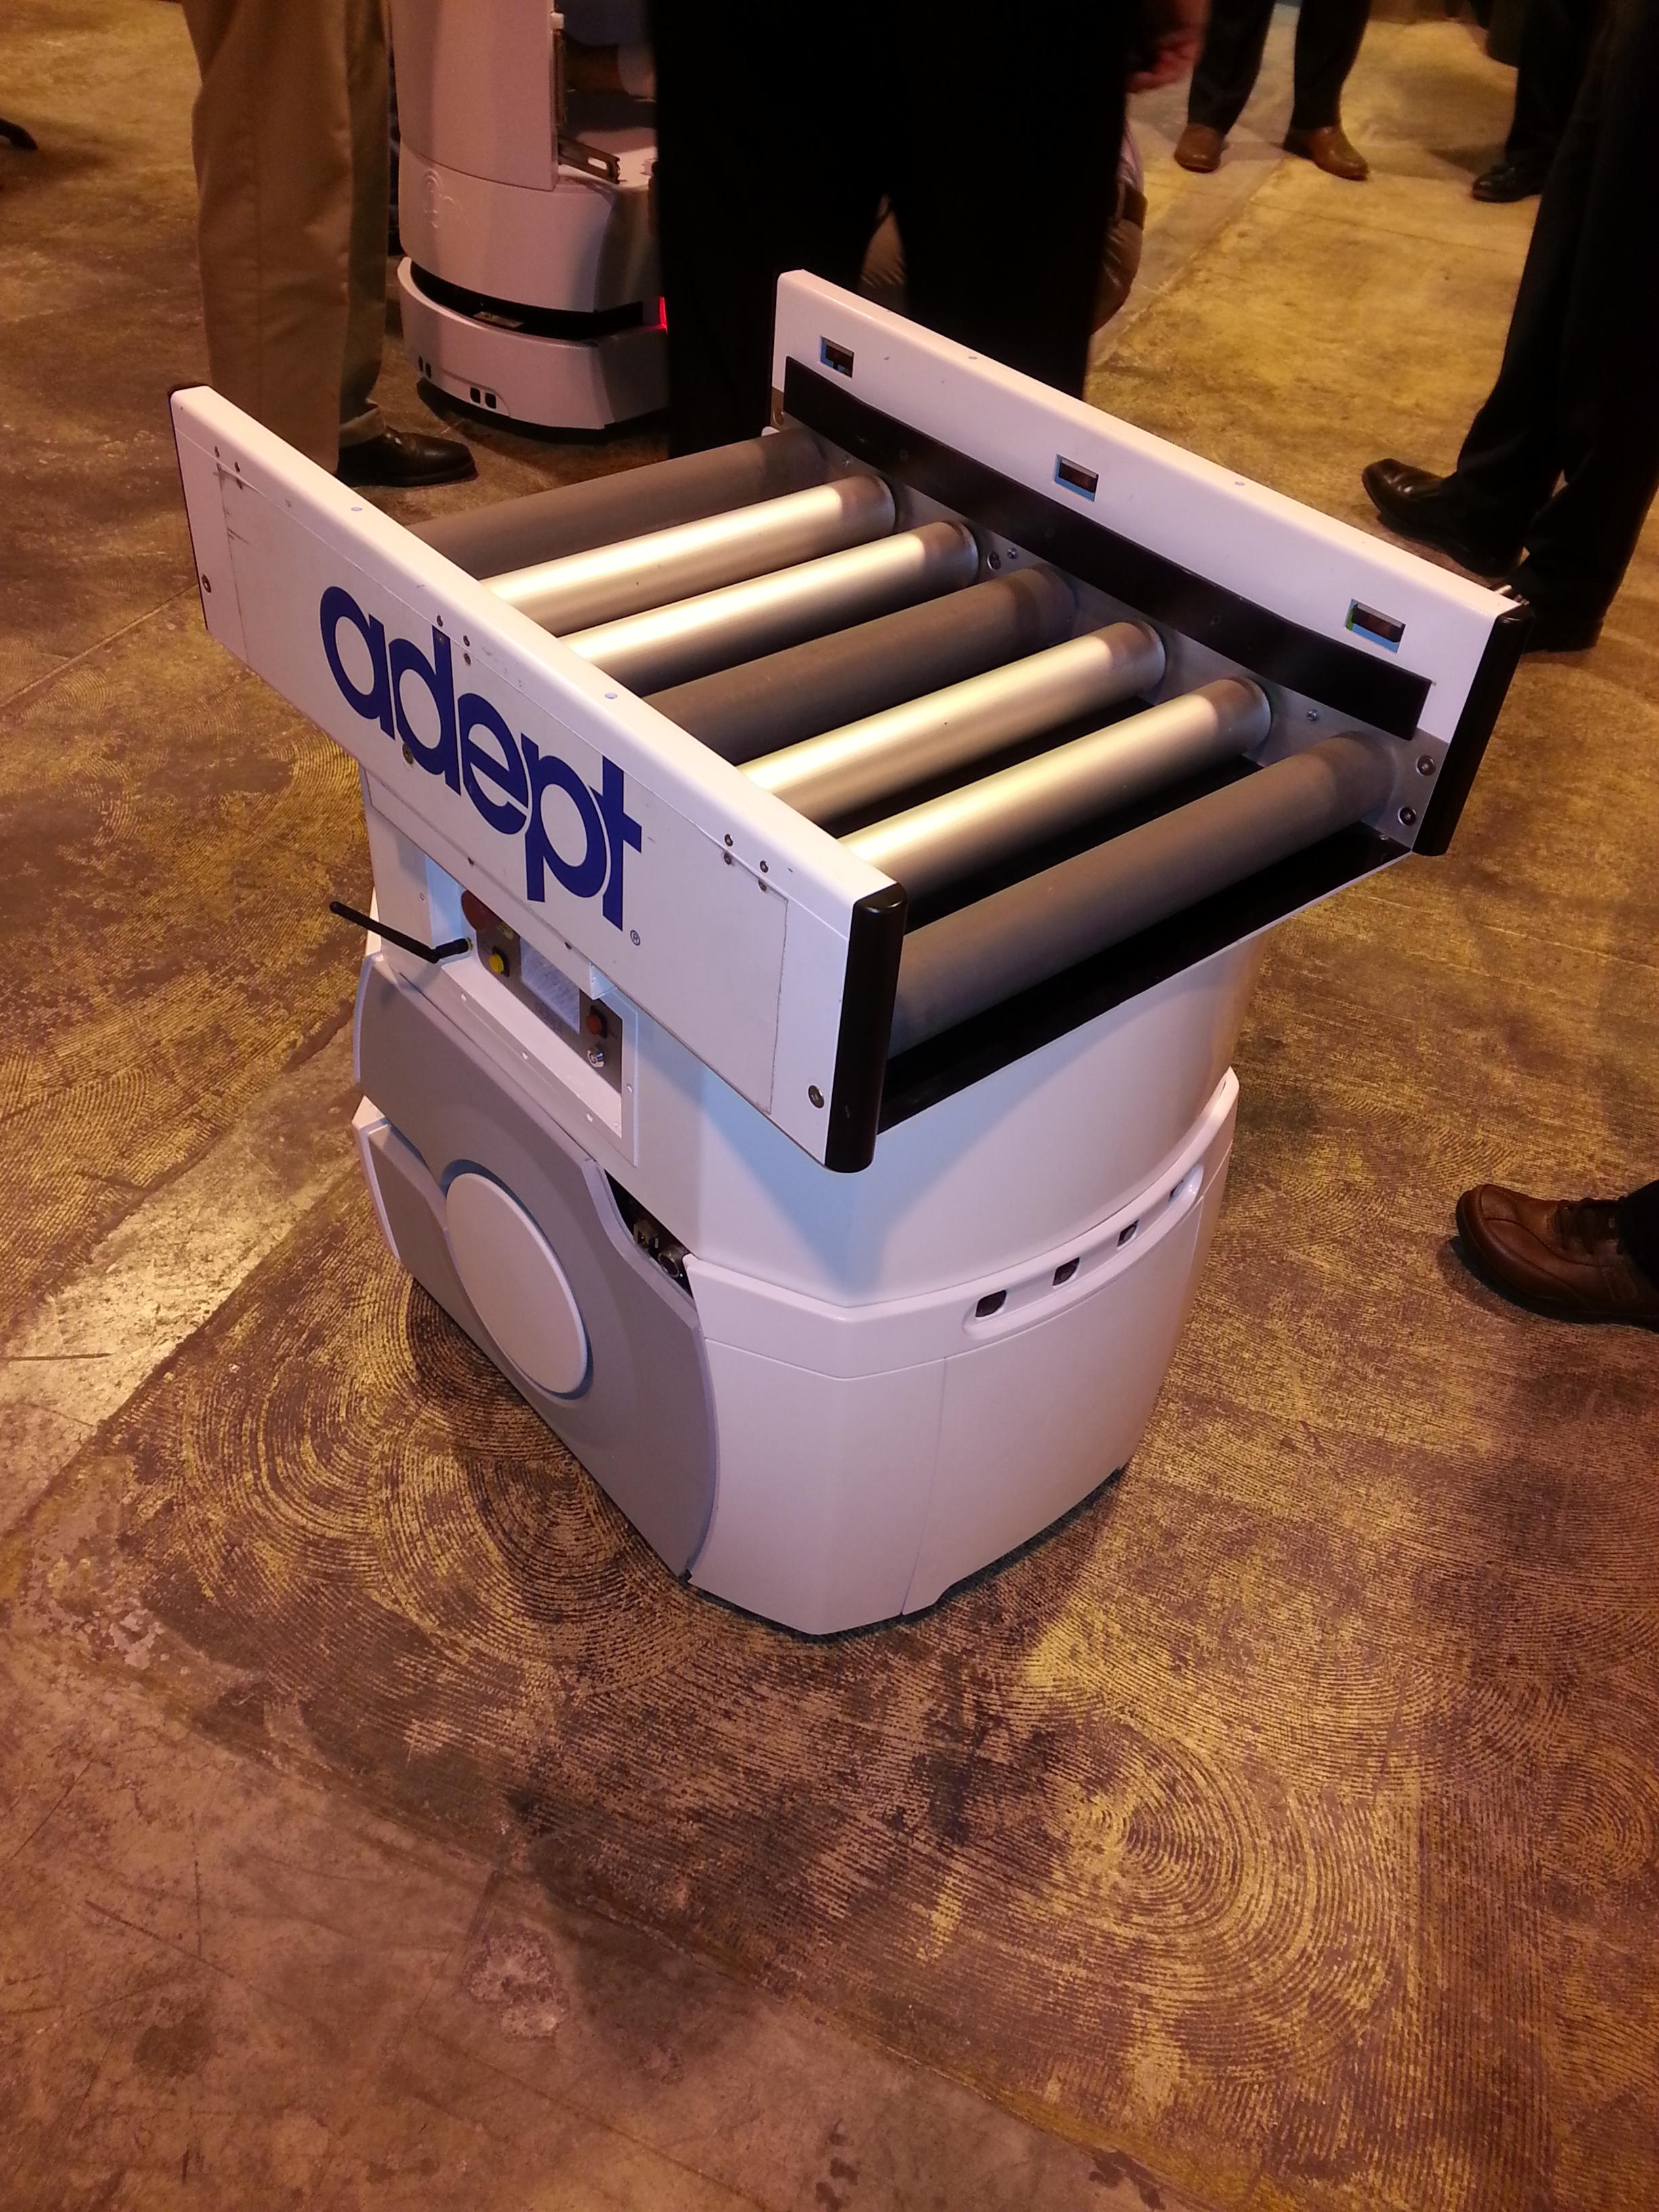 Adept Mobile Robots